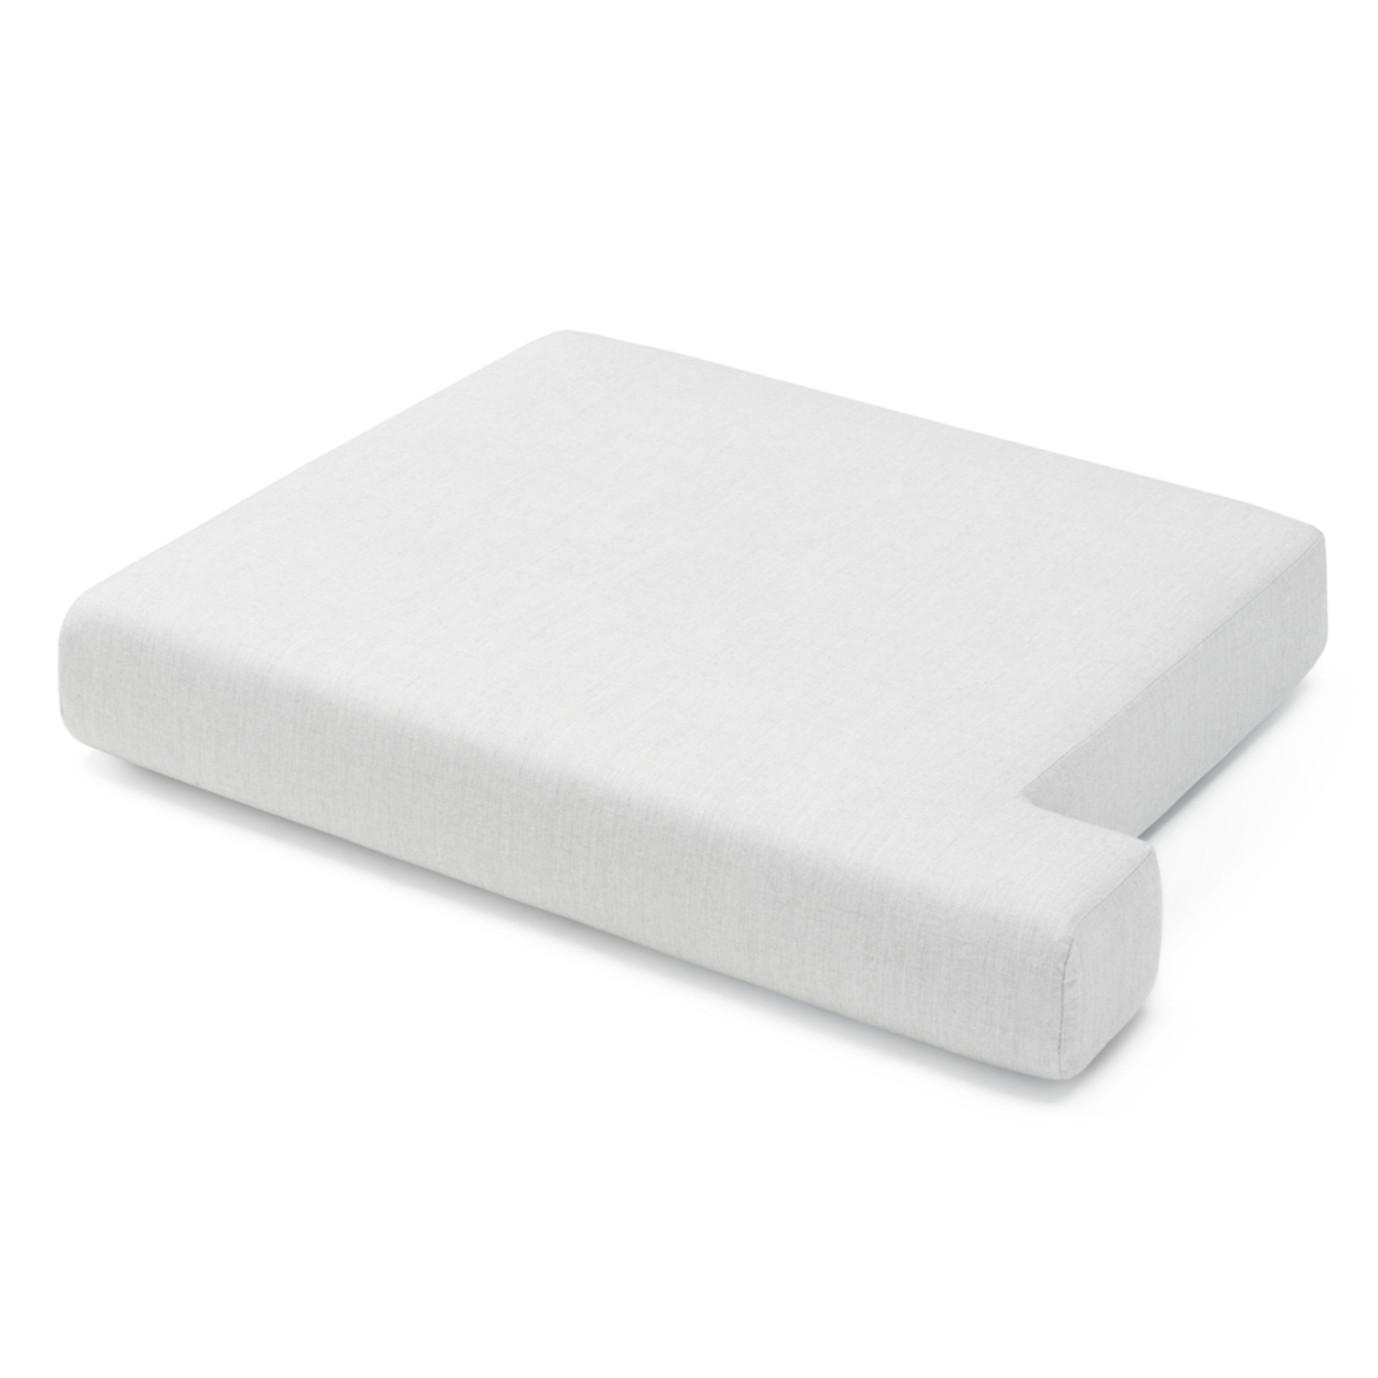 Portofino Sling 71in Loveseat Left Base Cushion - Space Gray